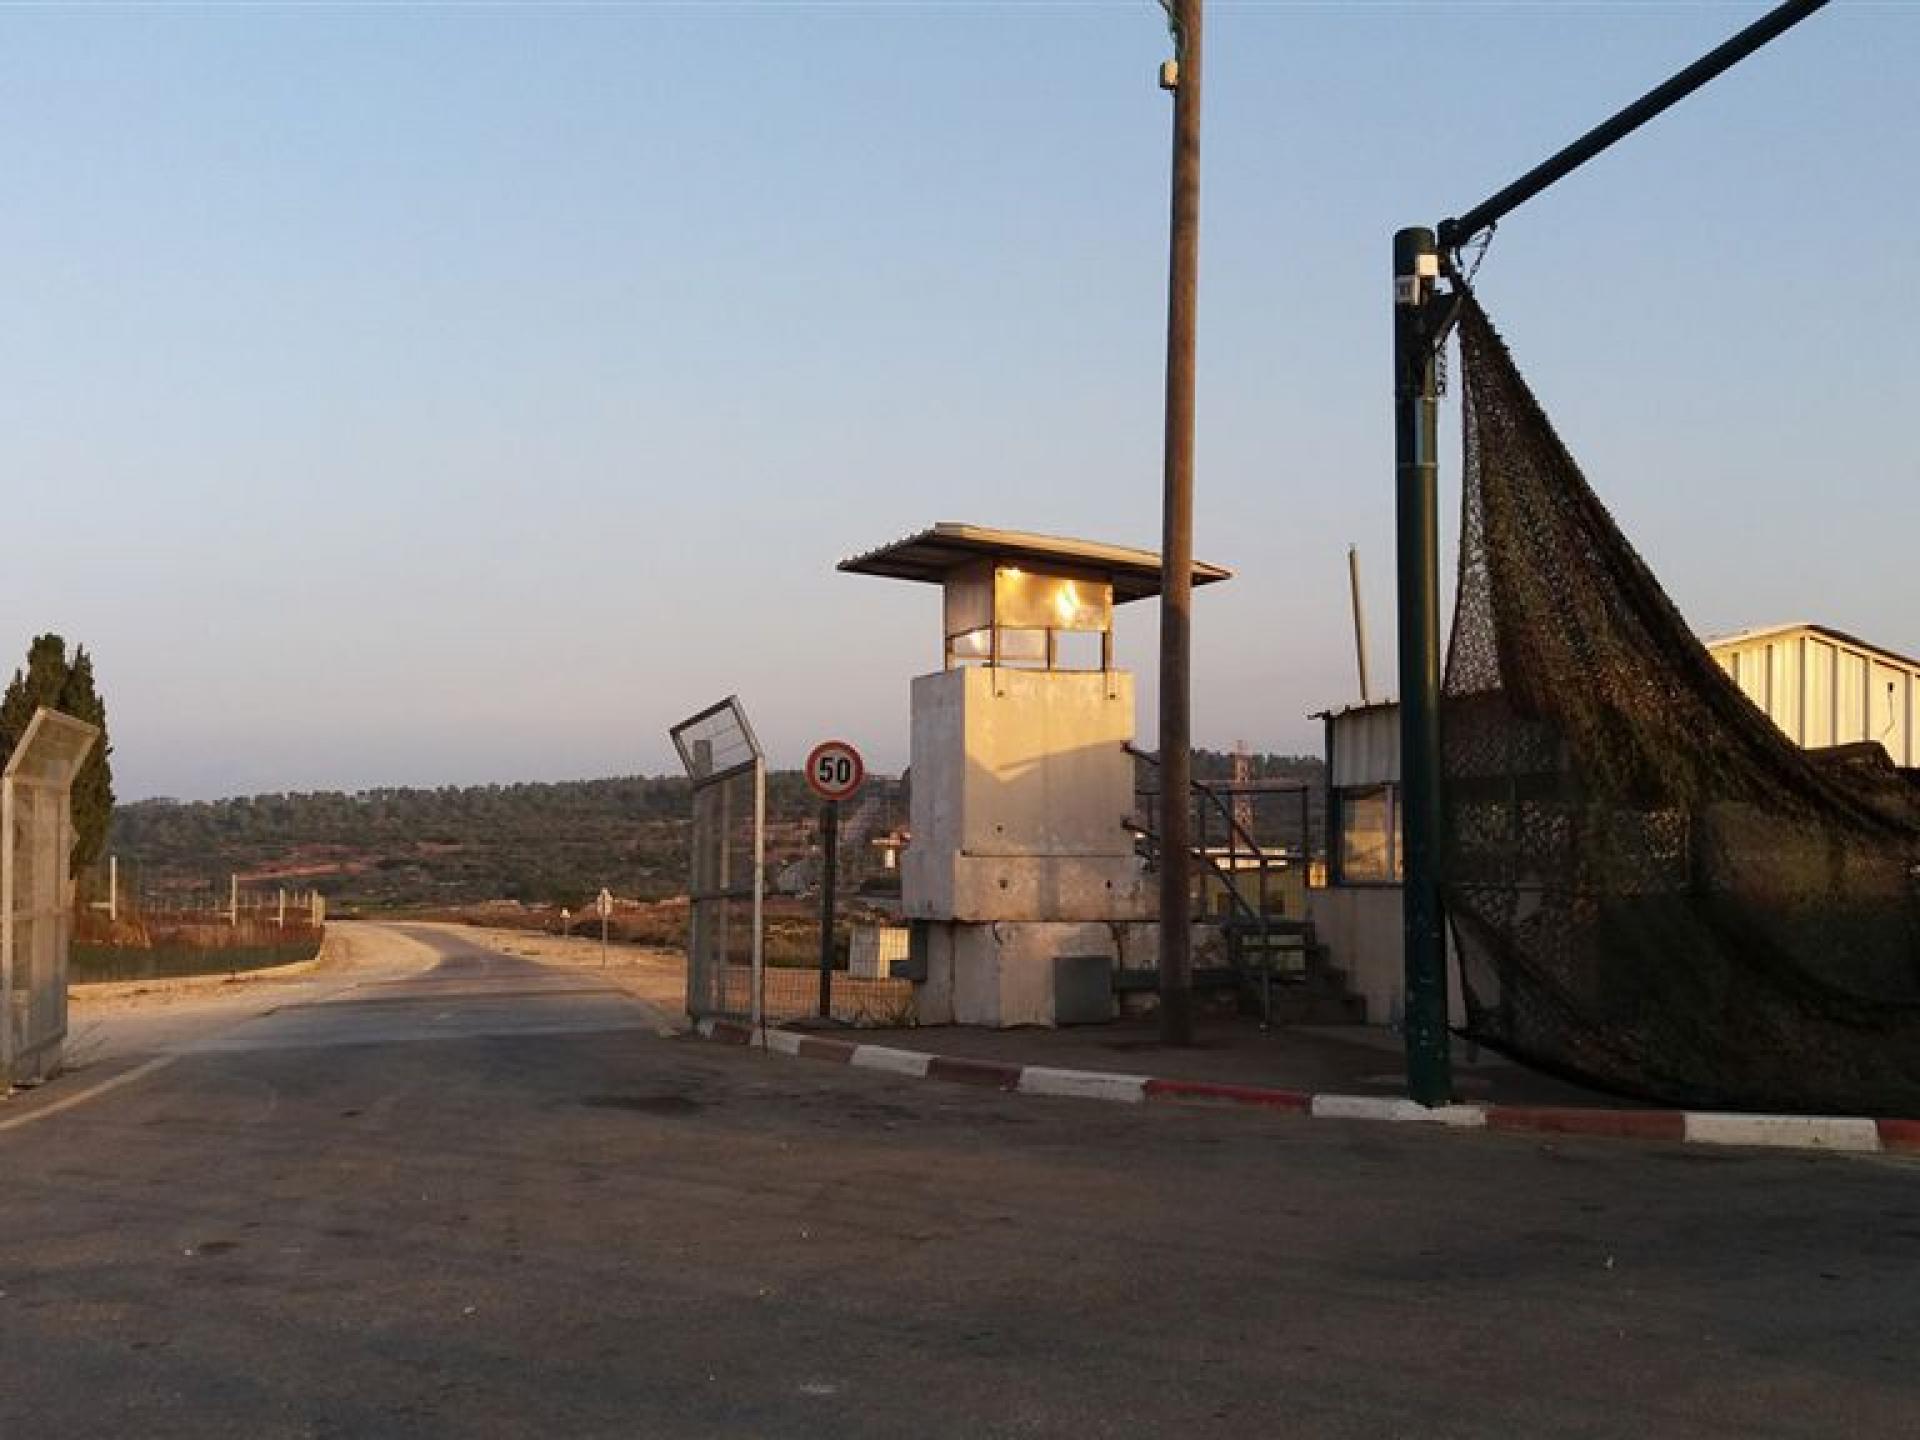 28.08.16 Tura-Shaked checkpoint מחסום טורה-שקד